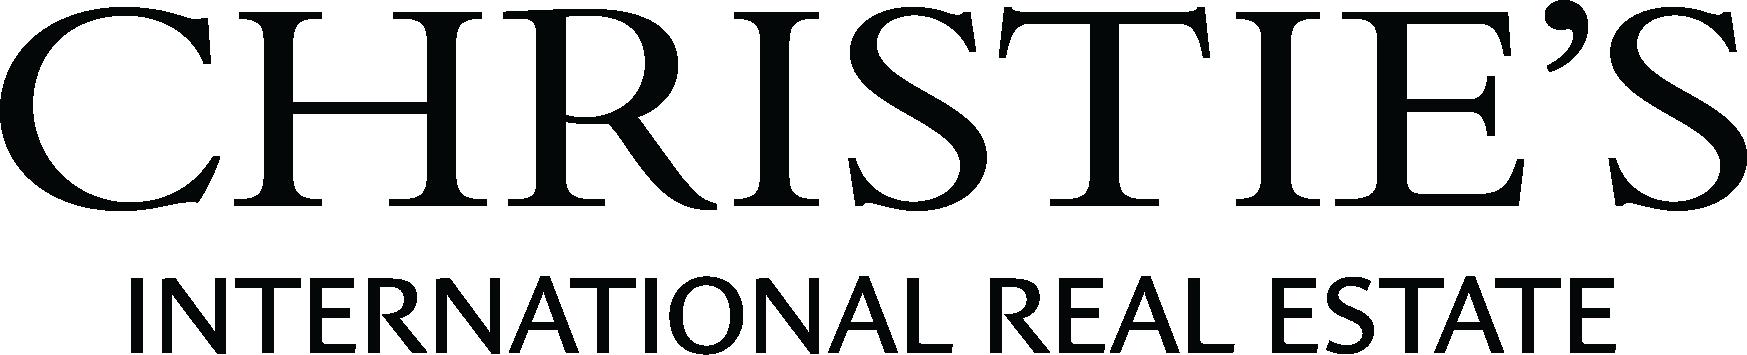 Christies-Real-Estate-Luxury-Real-Estate-Utah_Black@3x